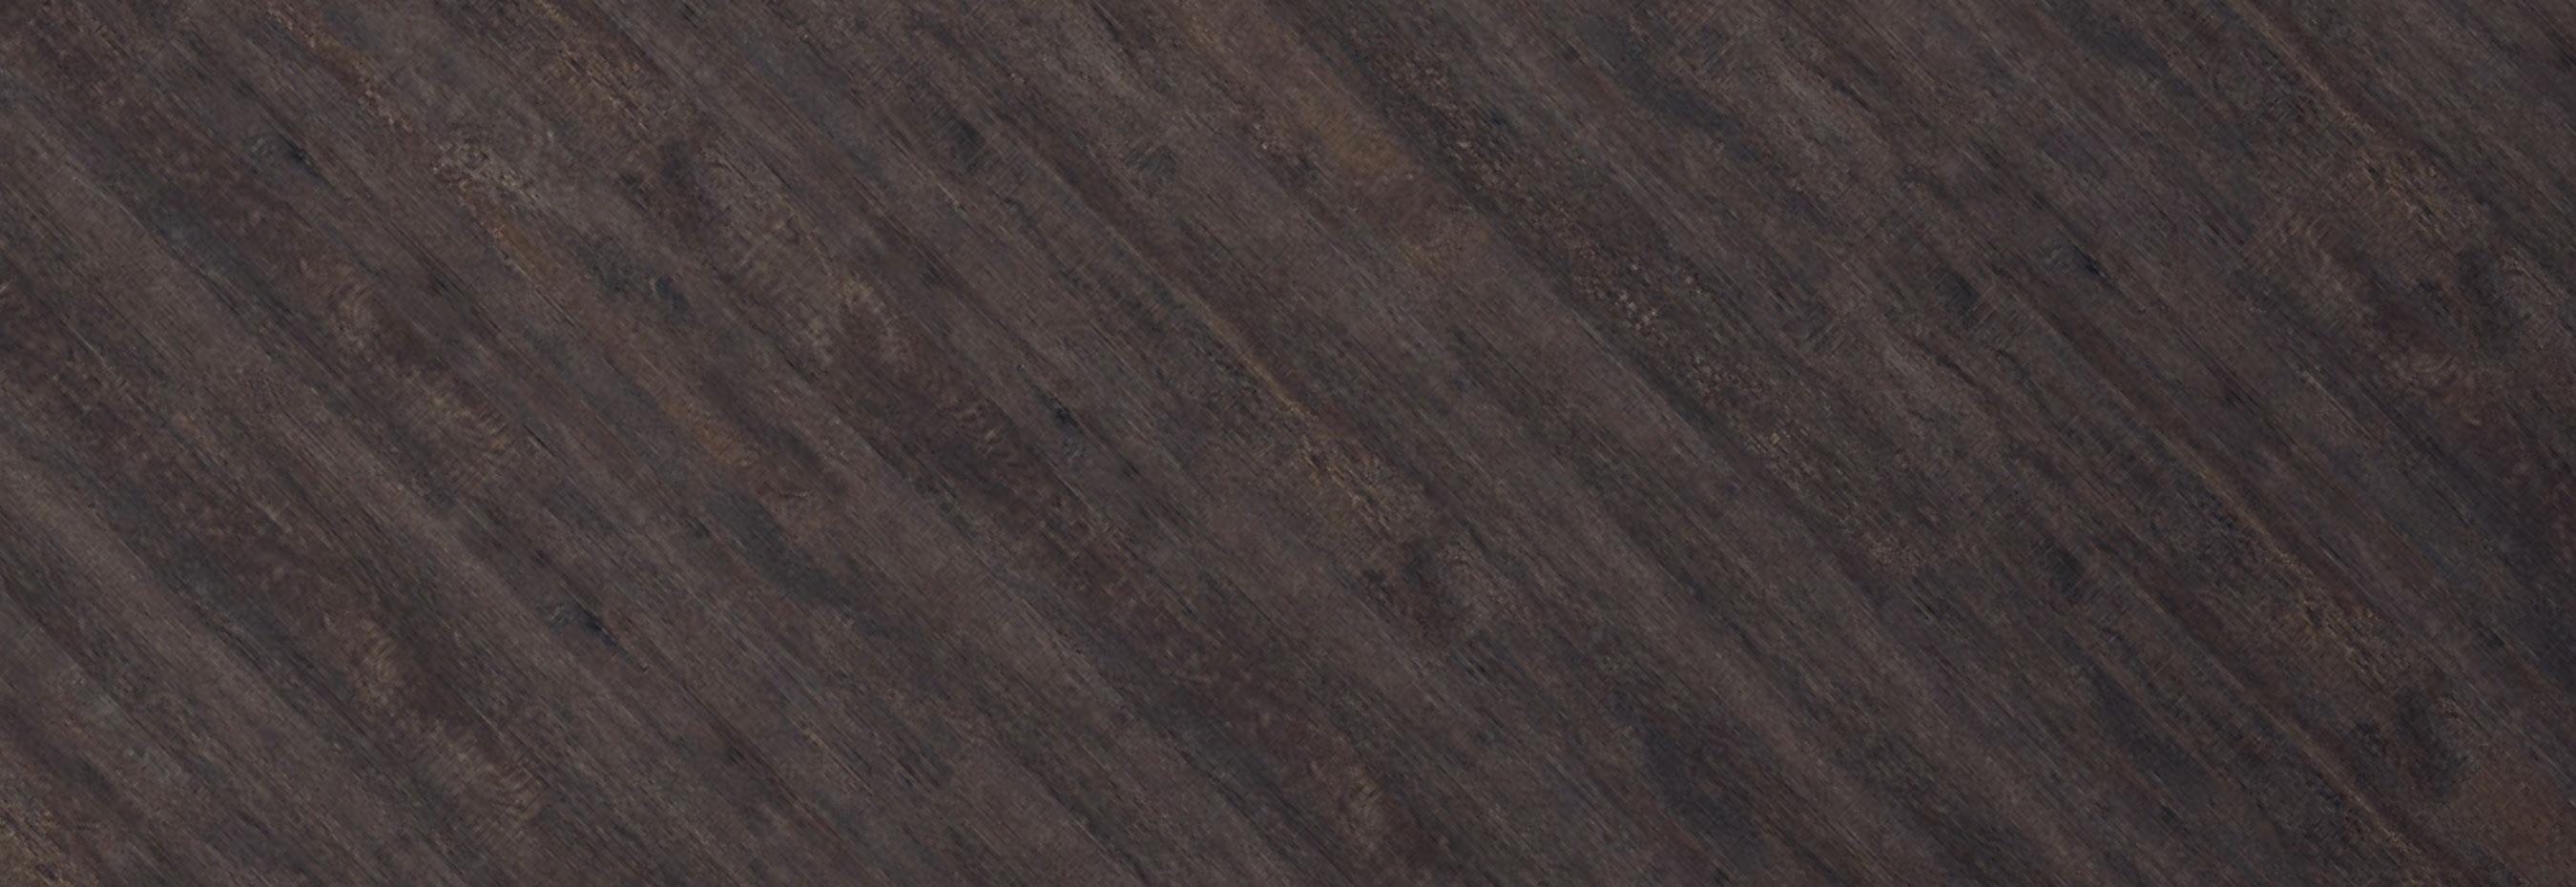 Inked Cedar: Beautifully designed LVT flooring from the Amtico ...